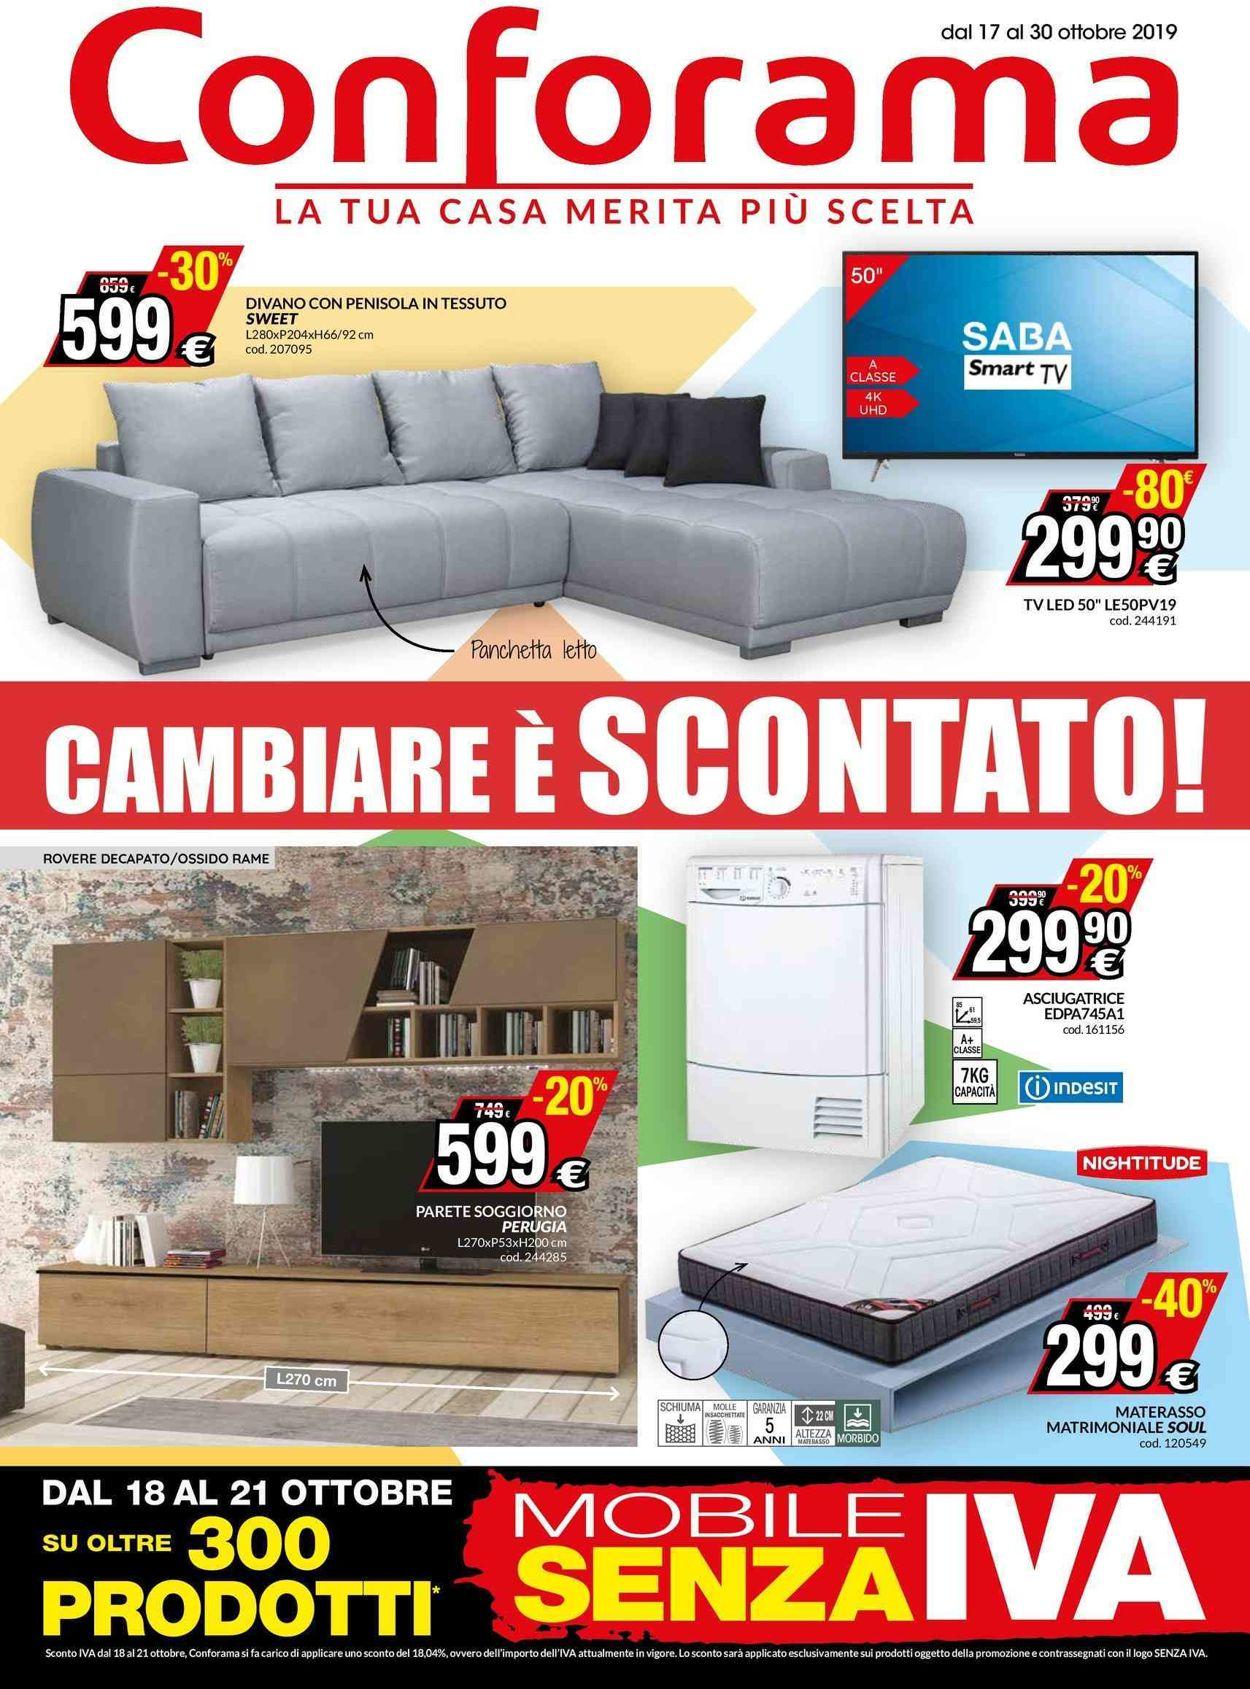 Volantino Conforama - Offerte 17/10-30/10/2019